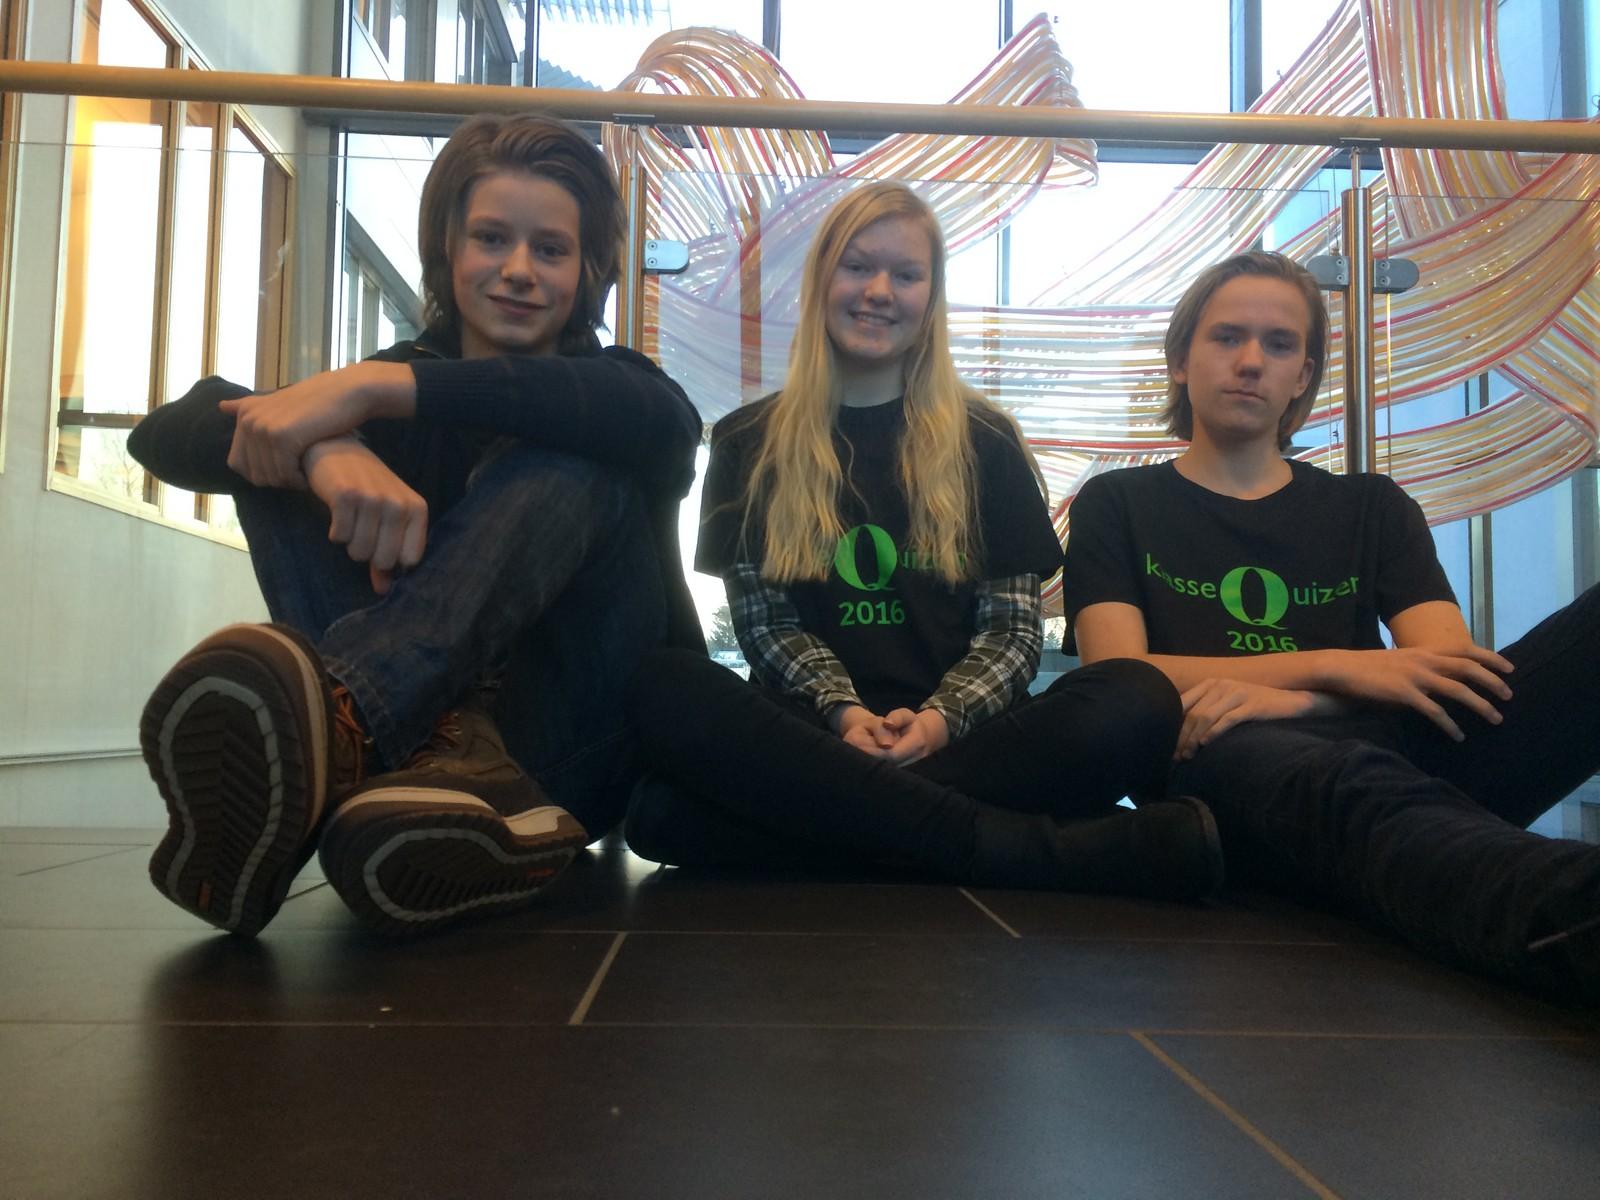 Tobias Frisvold Ruud, Ingrid Stubberud og Aksel Jordamo Lysne fra Ajer ungdomsskole fikk 10 poeng.